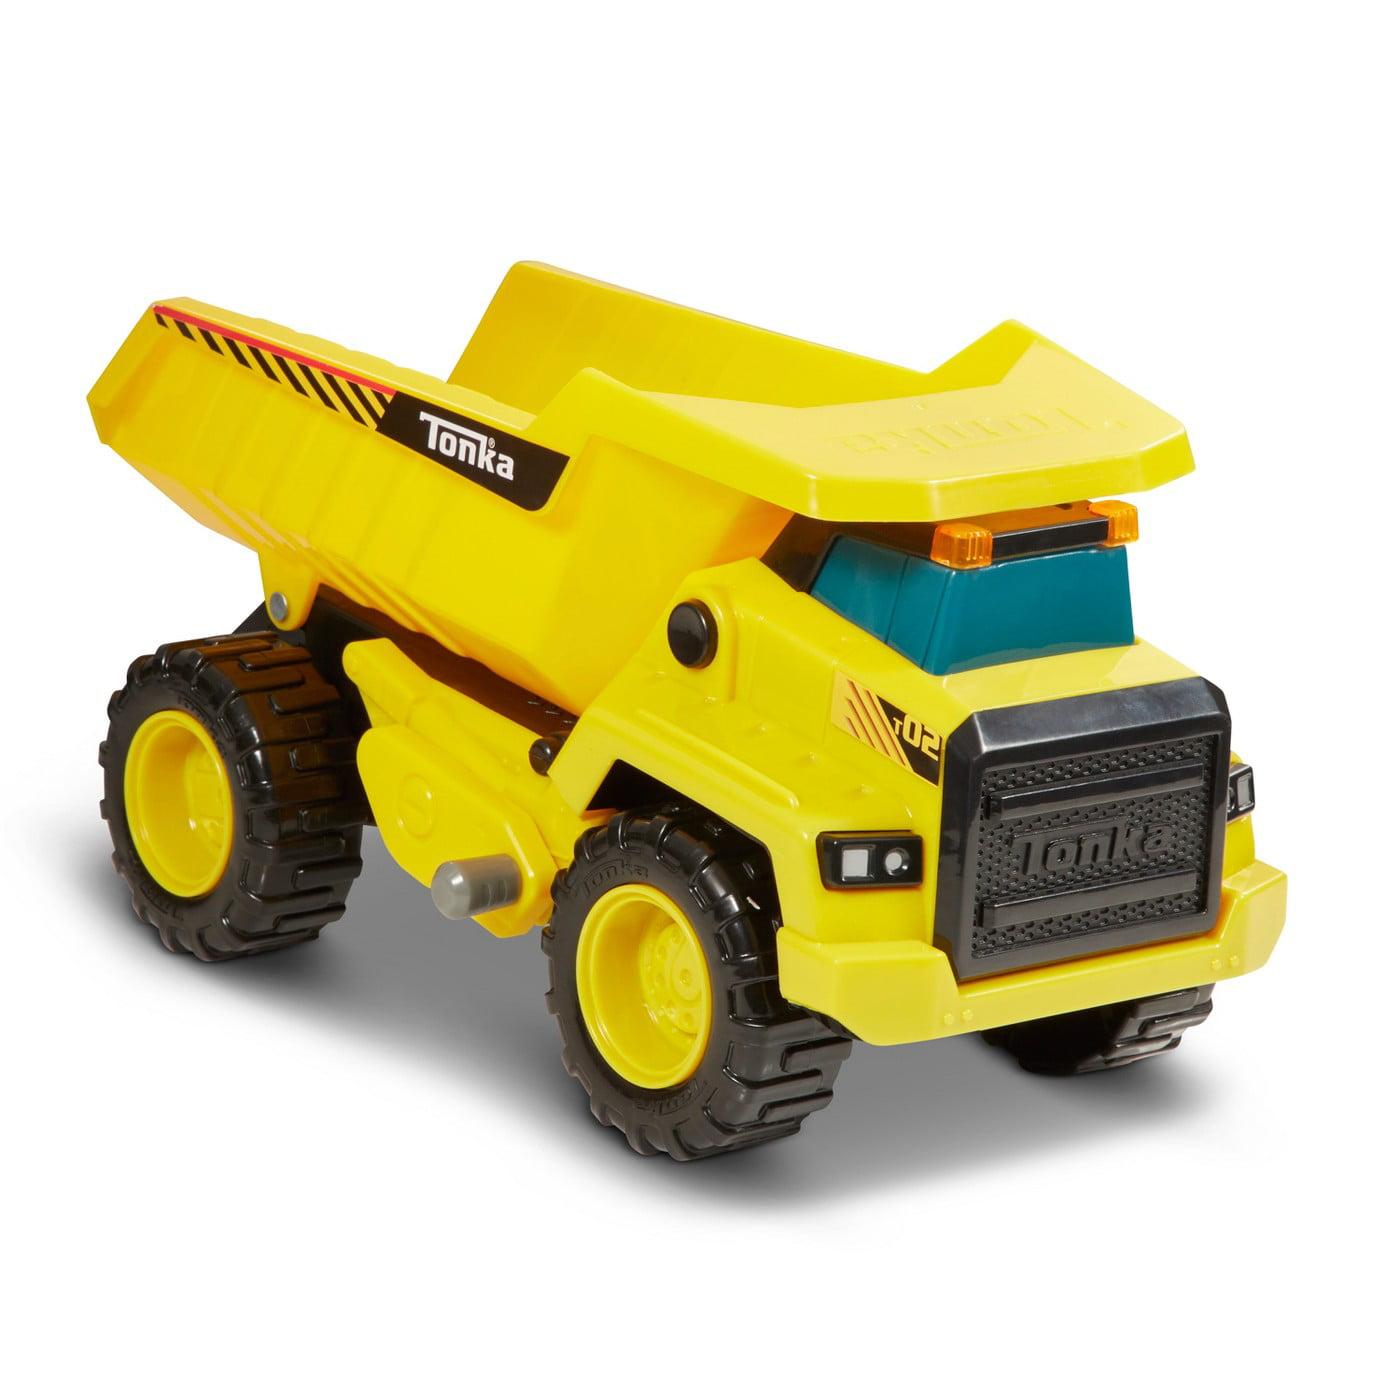 Funrise Toys - Tonka Power Movers Dump Truck